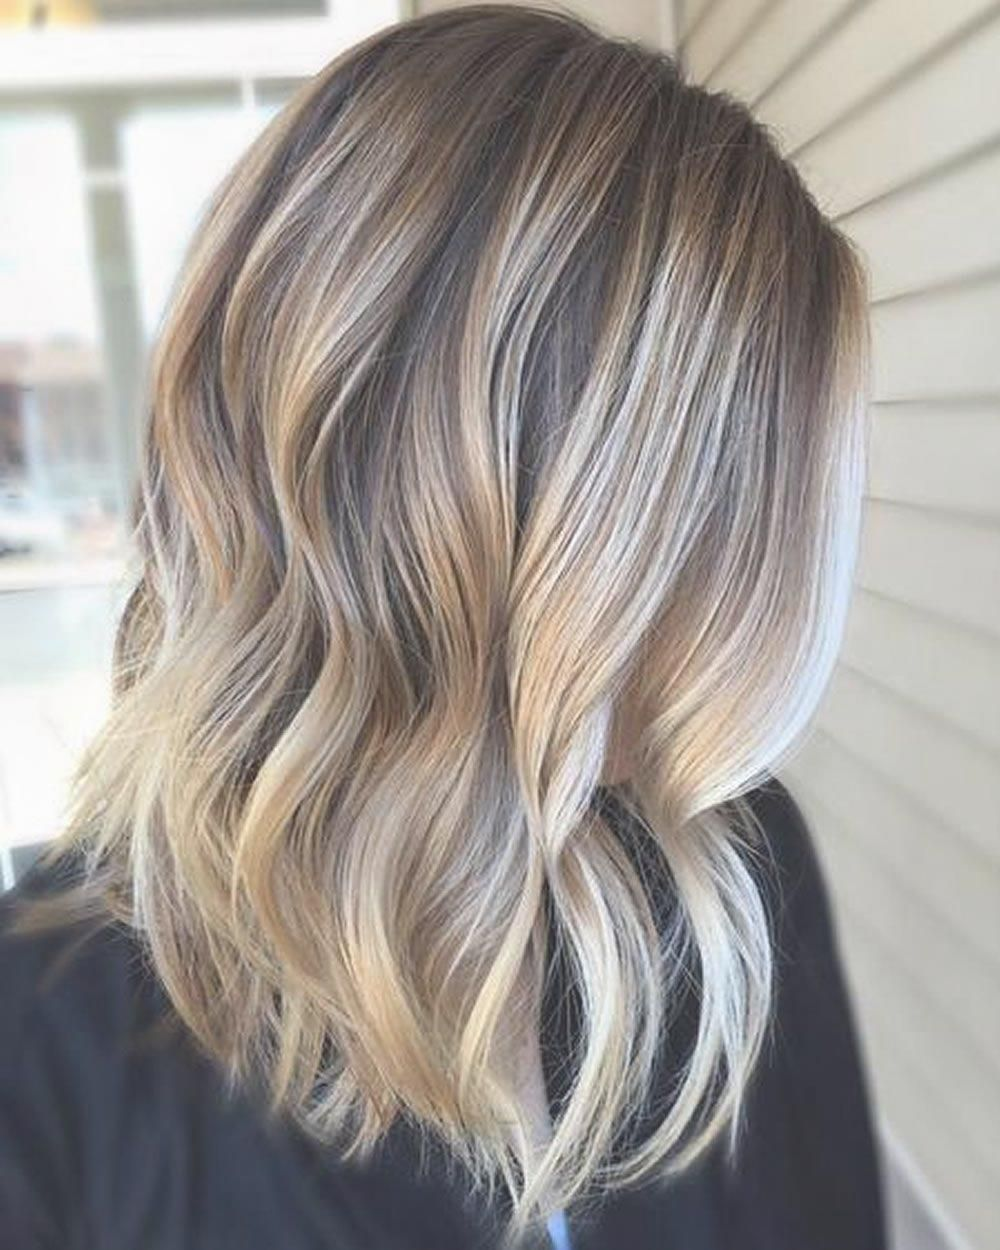 Ombre Frisuren 10 // #10 #Frisuren #Ombre  Blonde brown hair